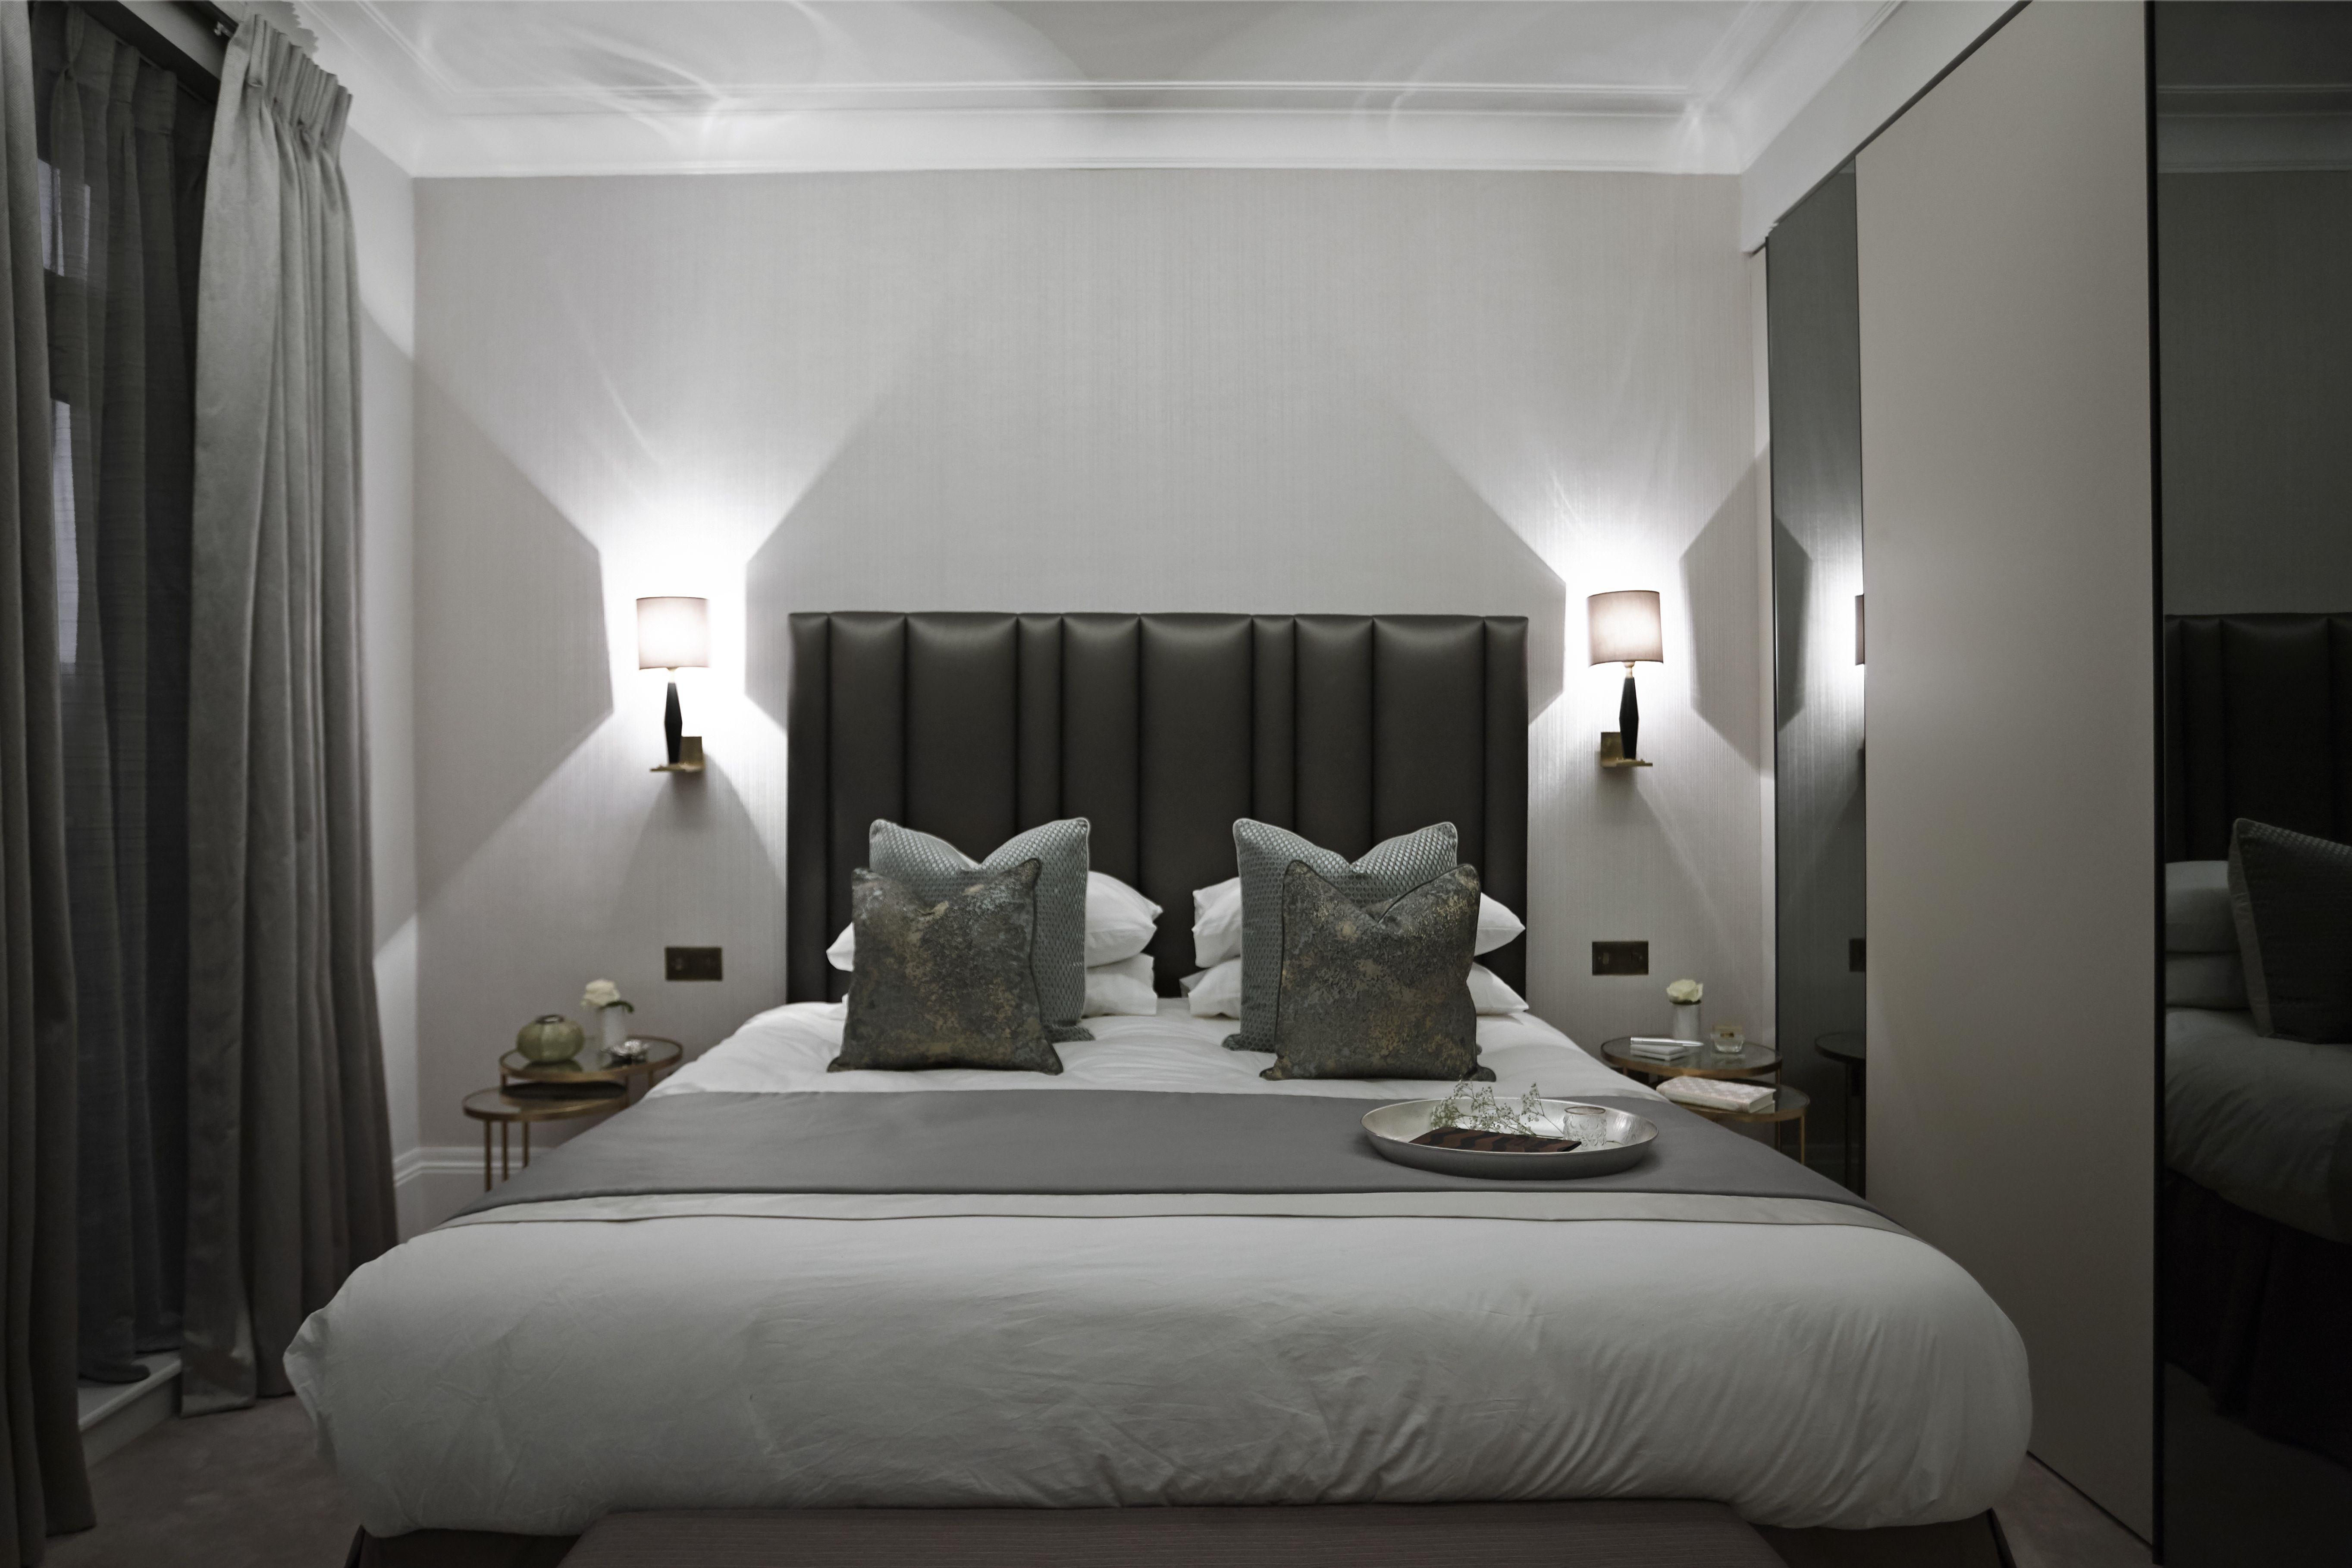 Boscolo Interior Design Mayfair Apartment Bedroom Interiordesign Bed Luxury Lights Wardrobe